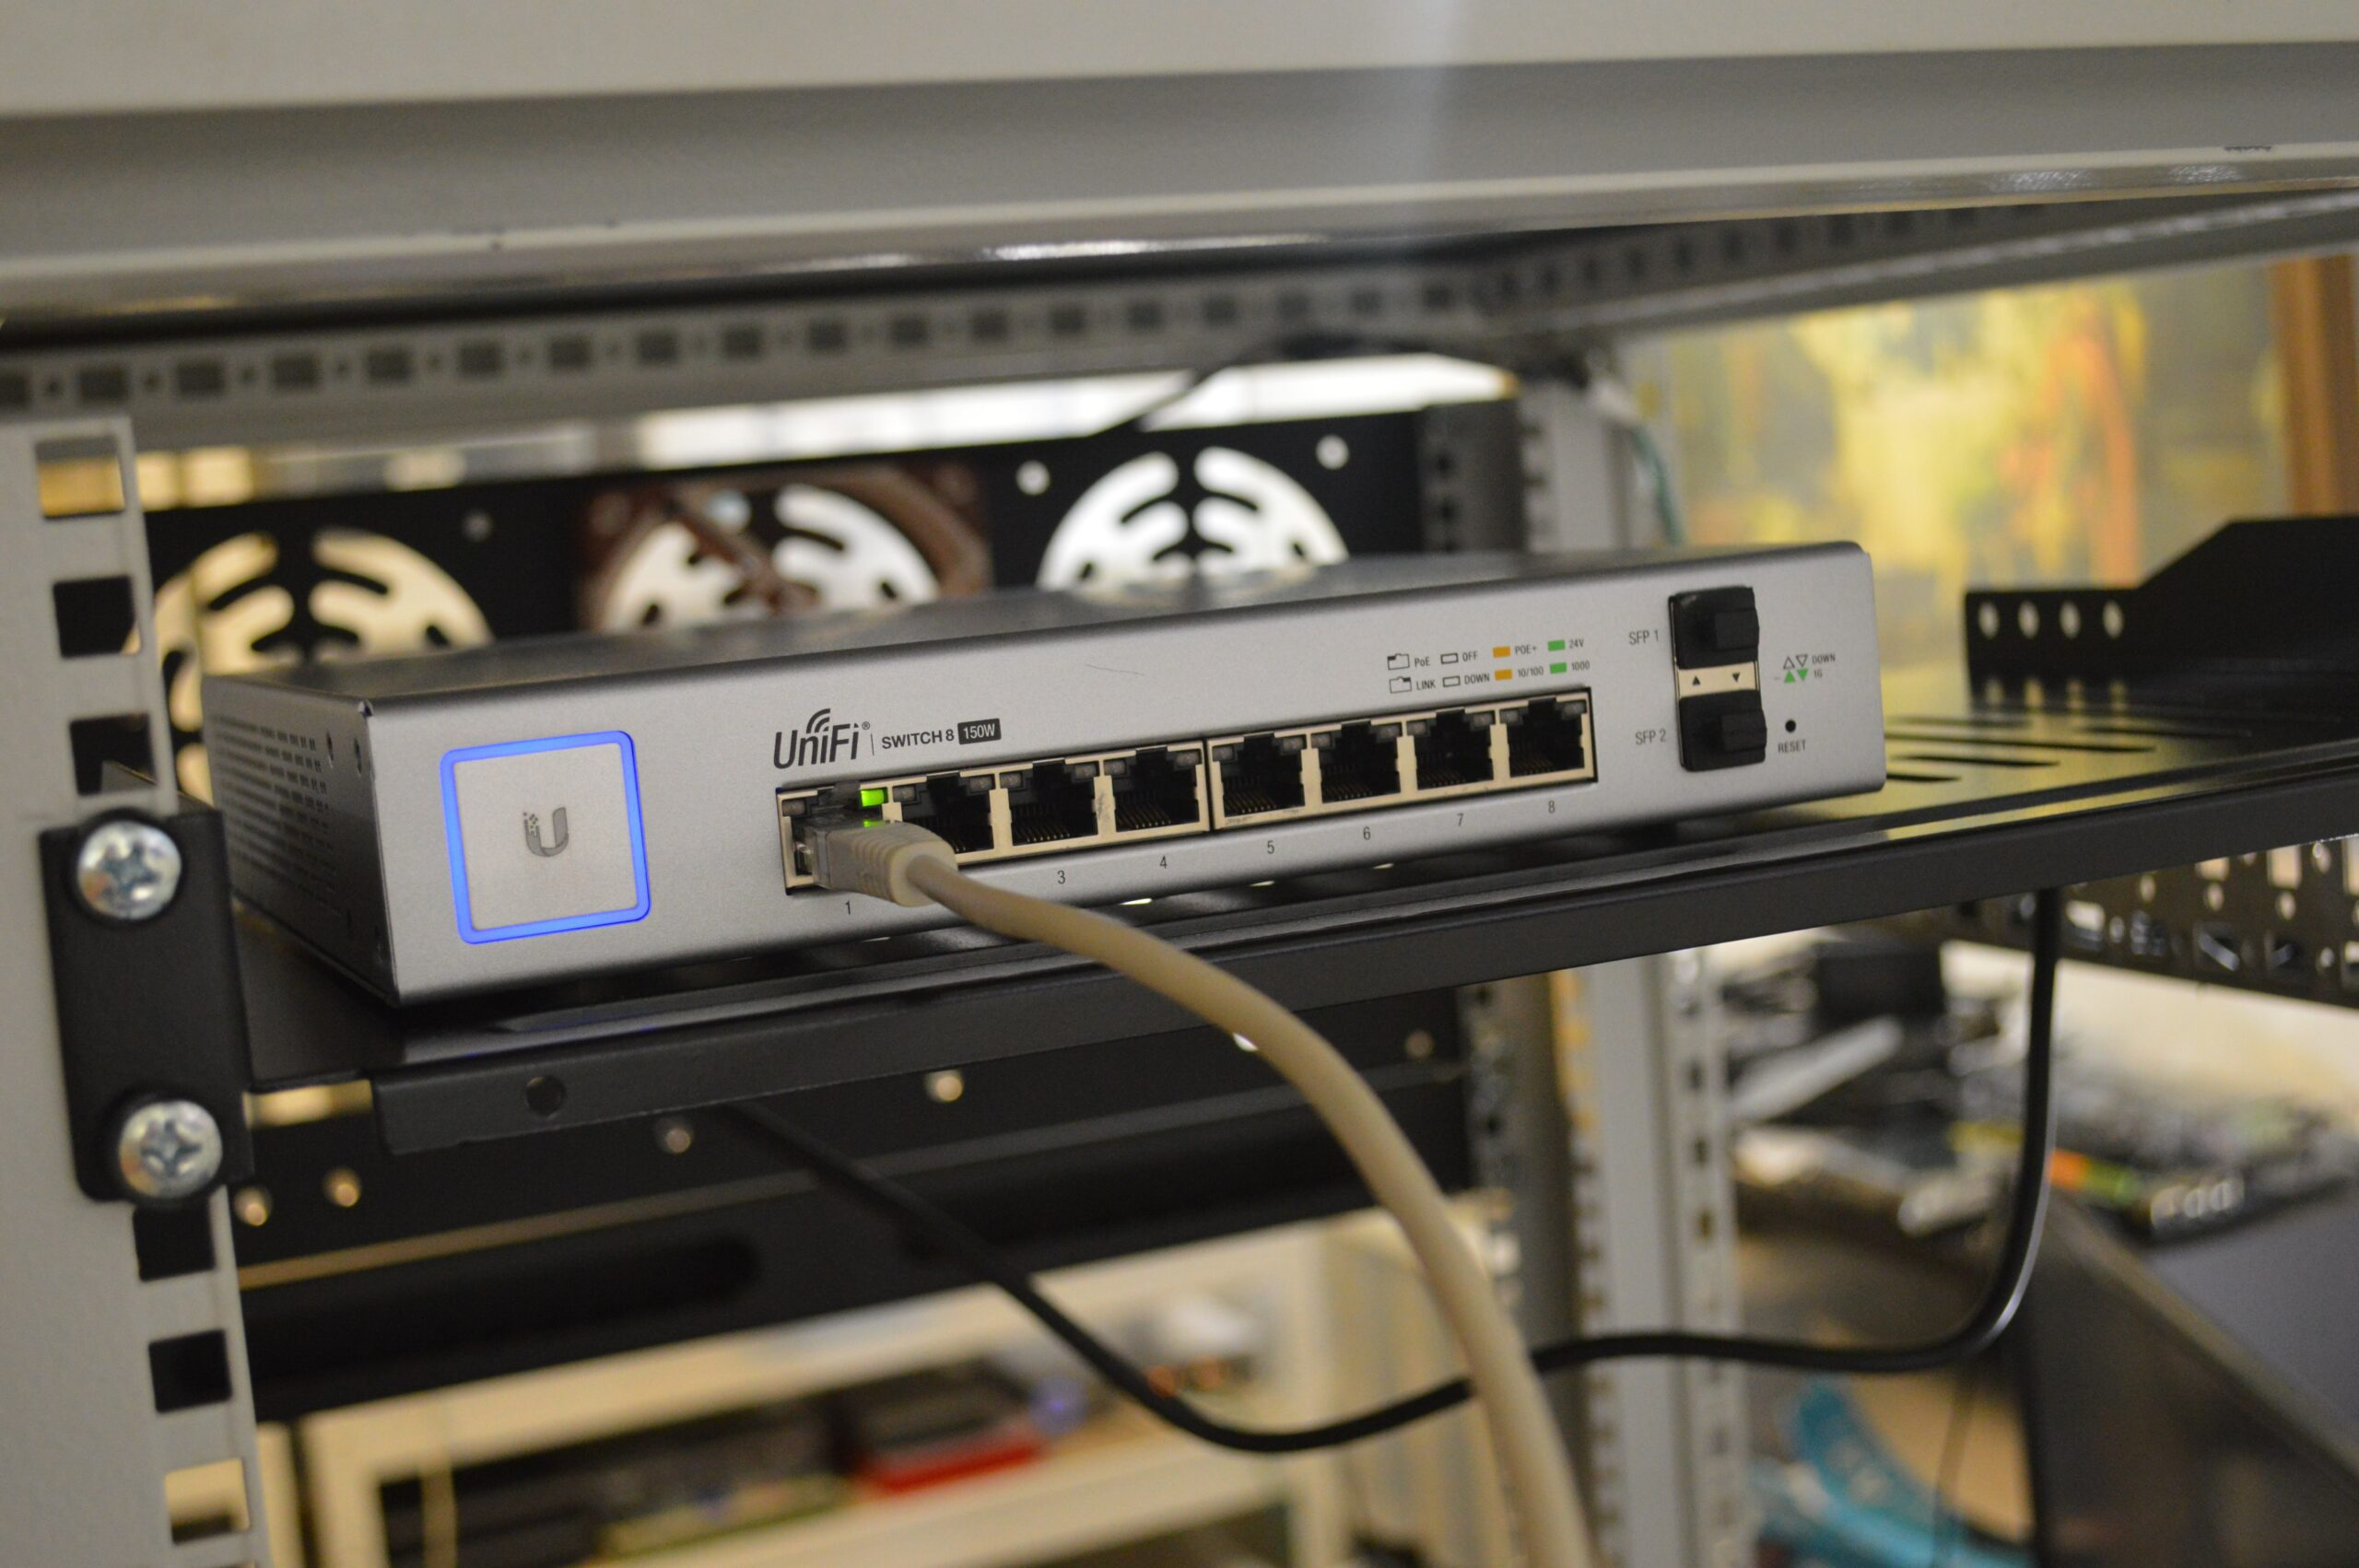 thomas-jensen-Unifi Switch Internet-unsplash